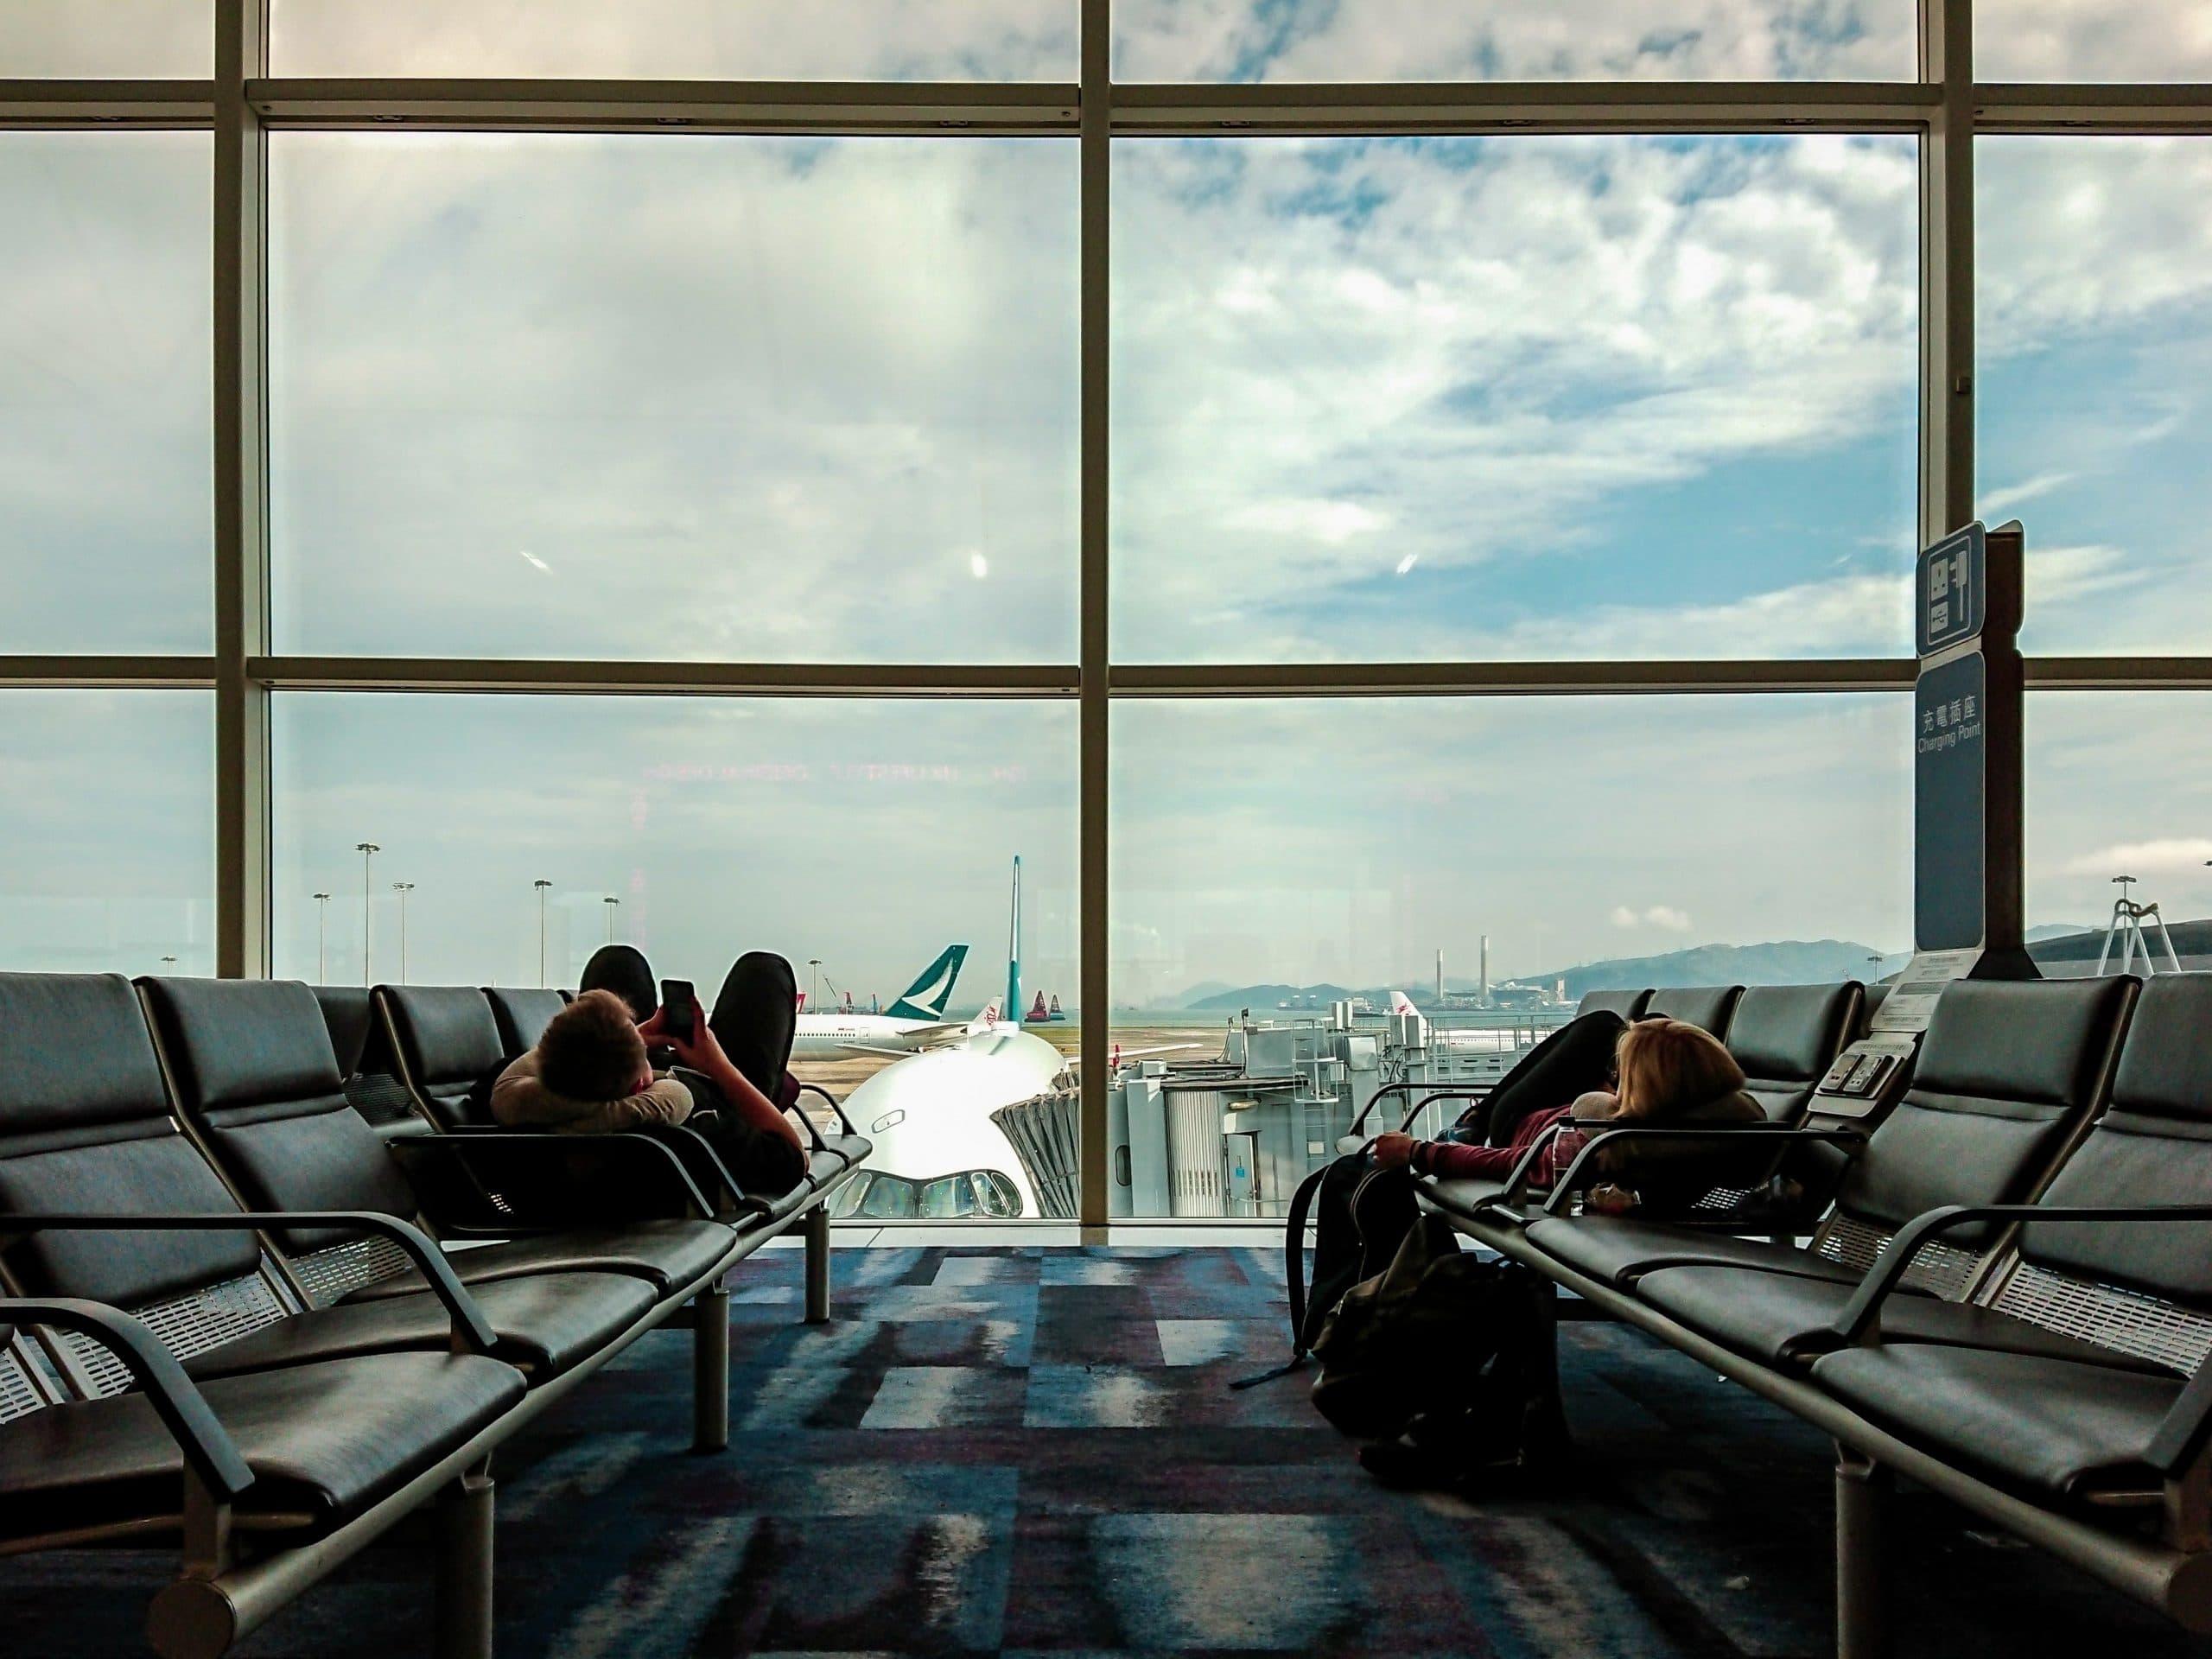 Airport Transfers Sunshine Coast to Brisbane - Airplane close up